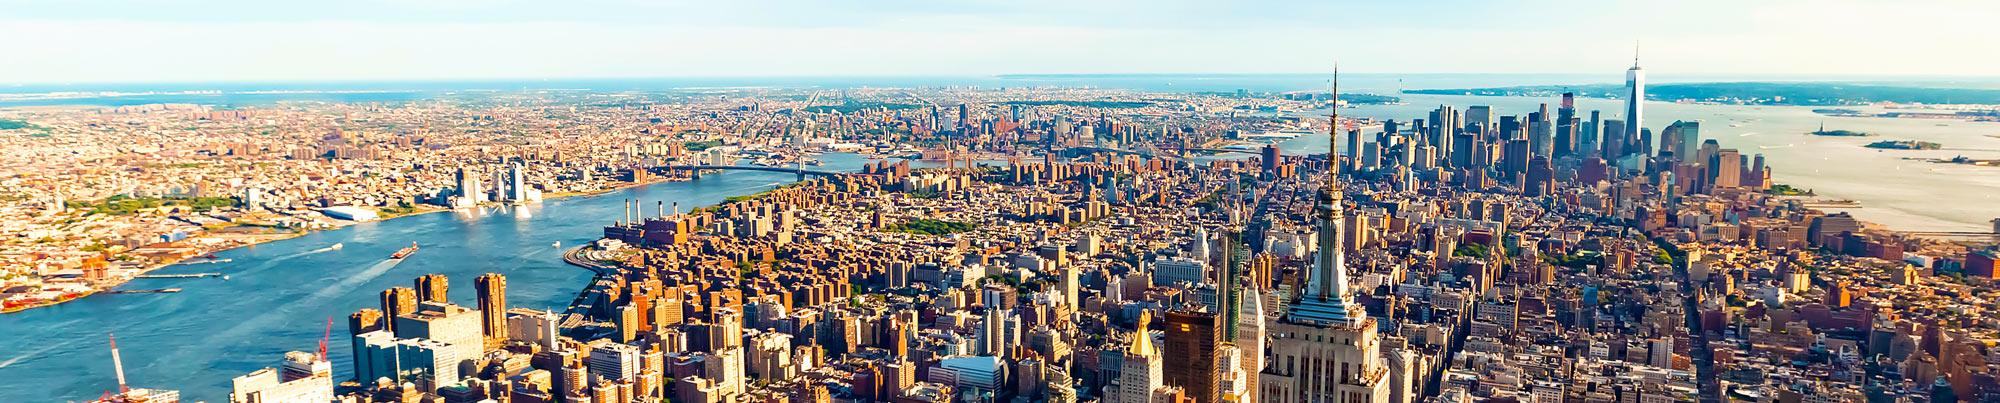 New York Quarterly Meeting of Quakers